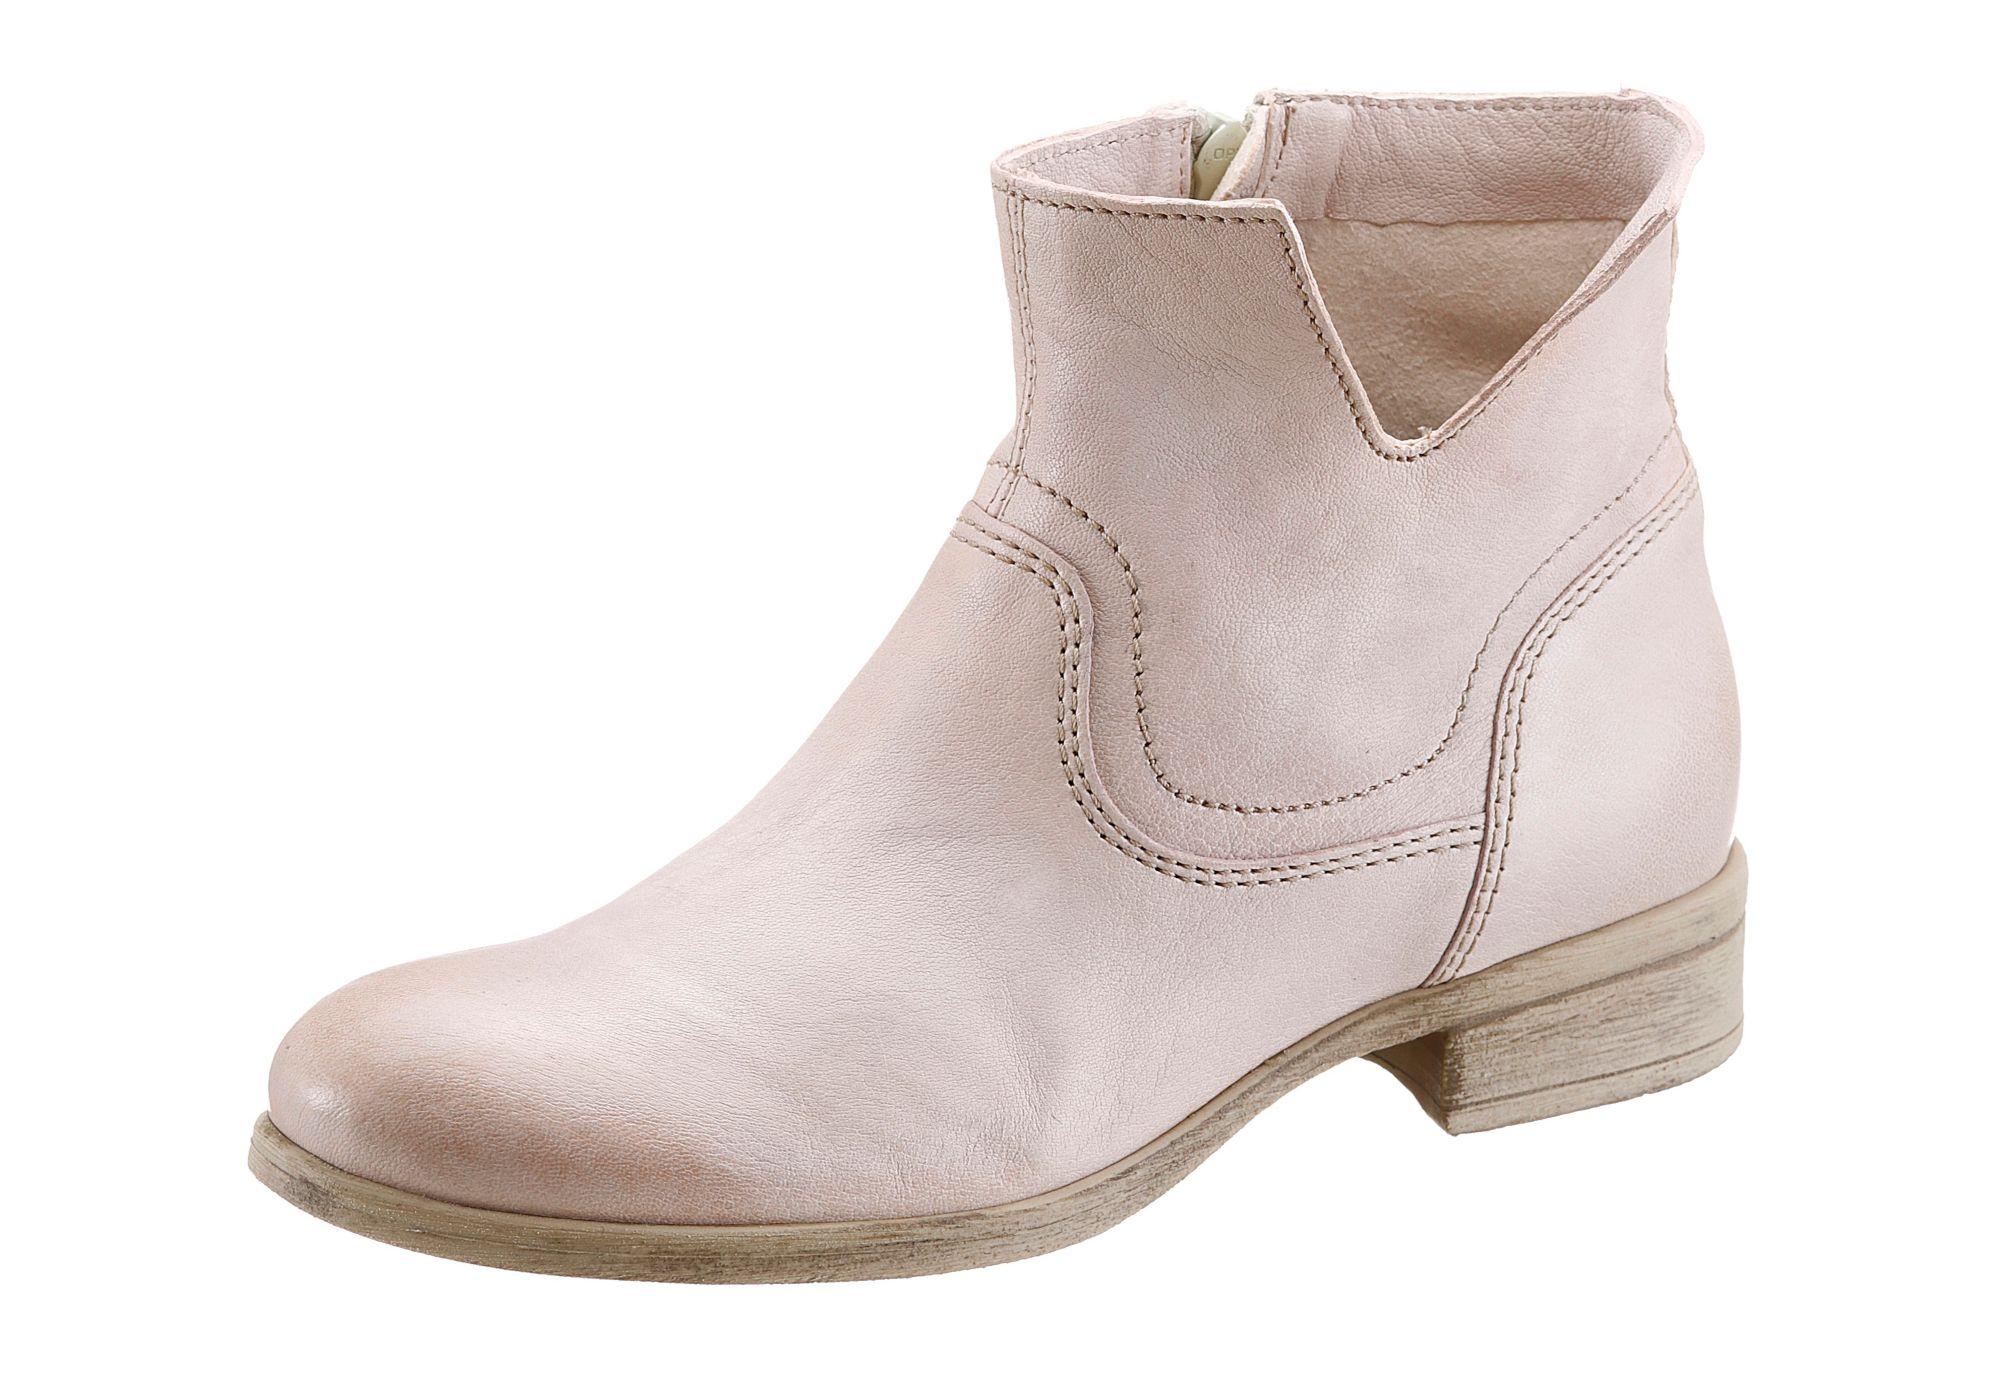 ARIZONA Arizona Boots im trendigen Used-Look